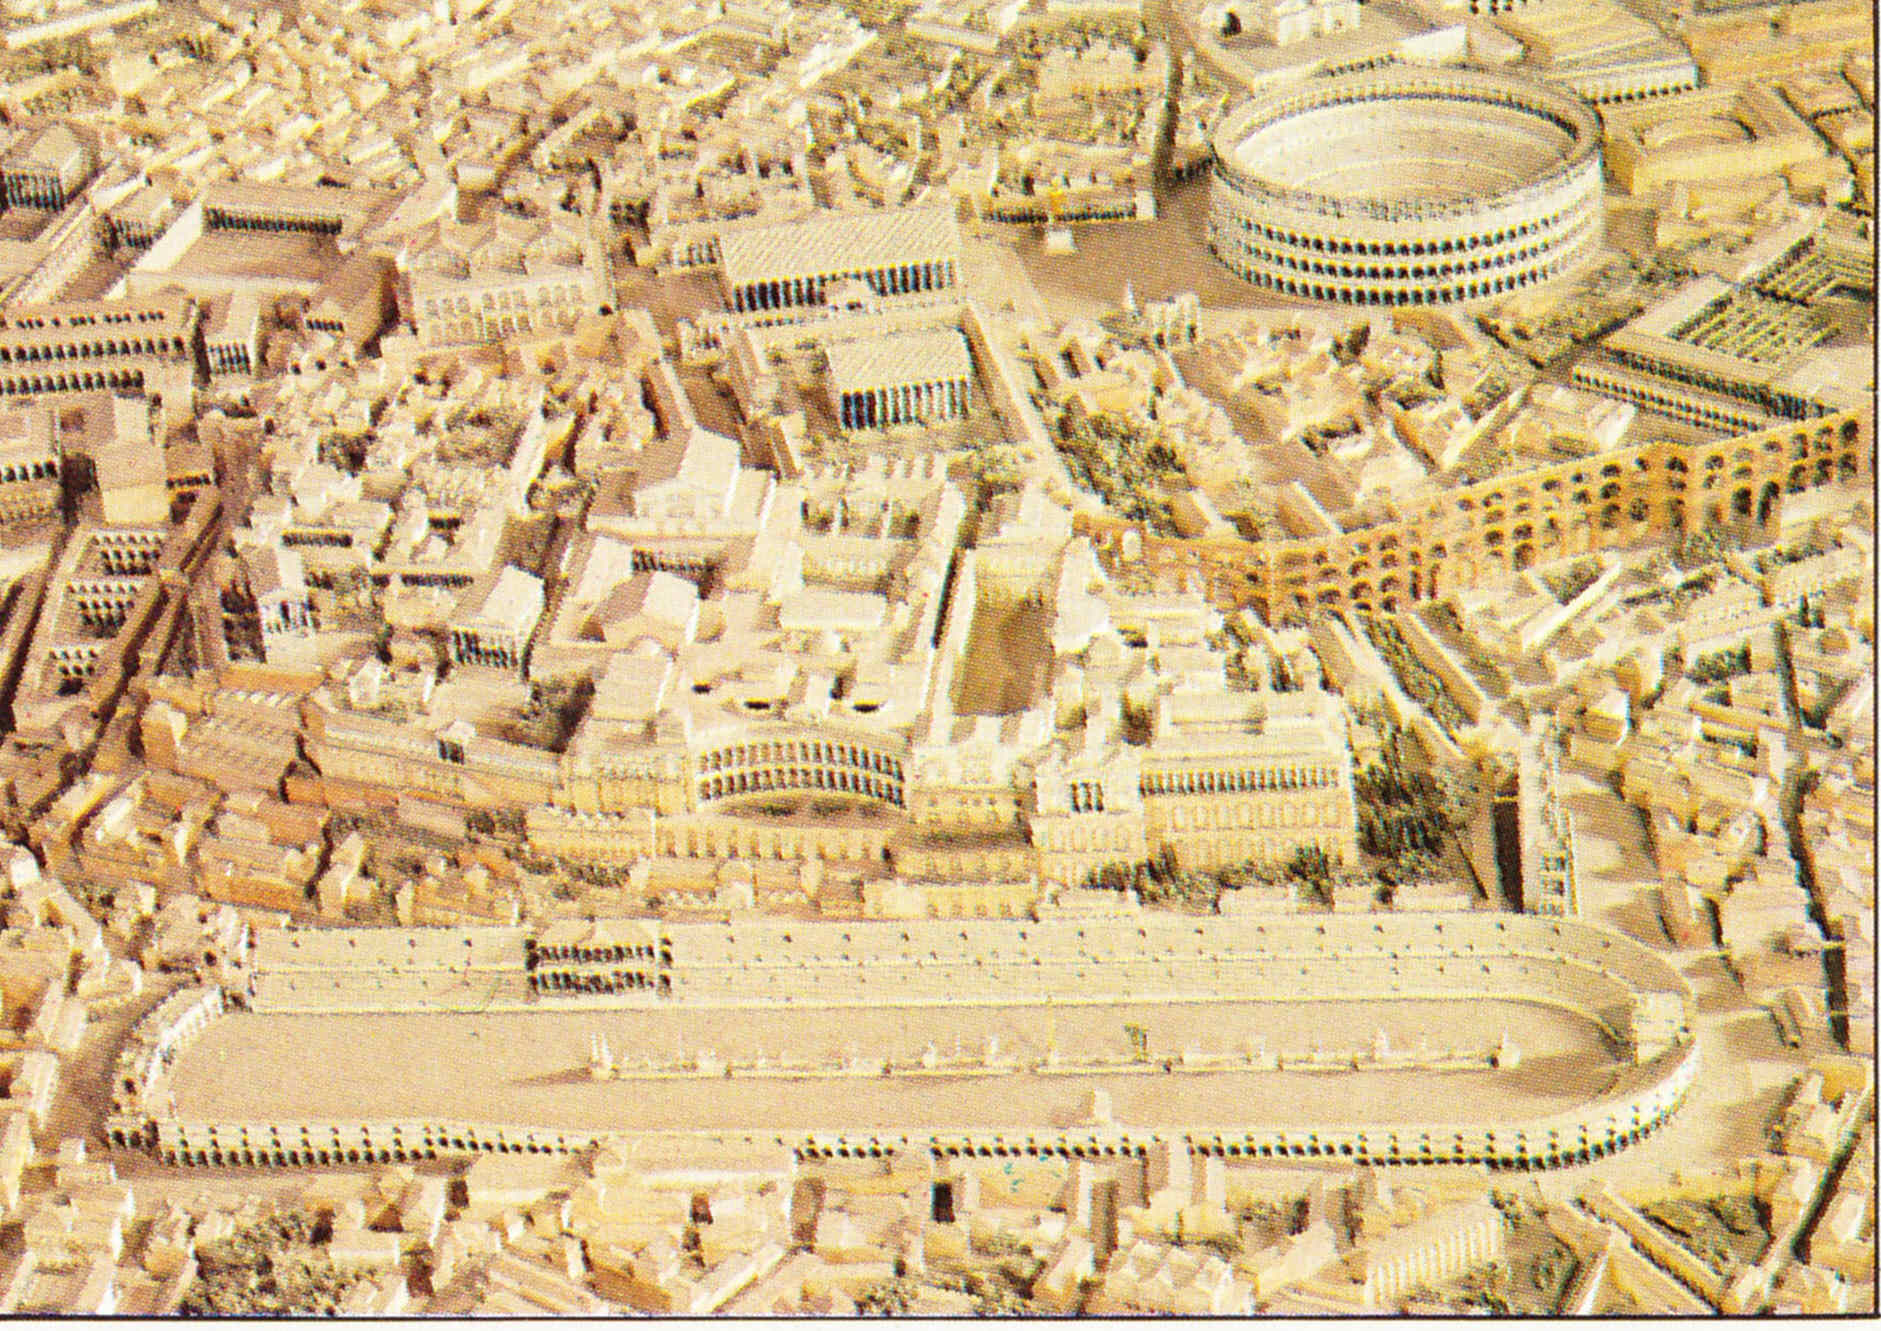 Egipto Antiguo 63 y Ptolomeo XII 6